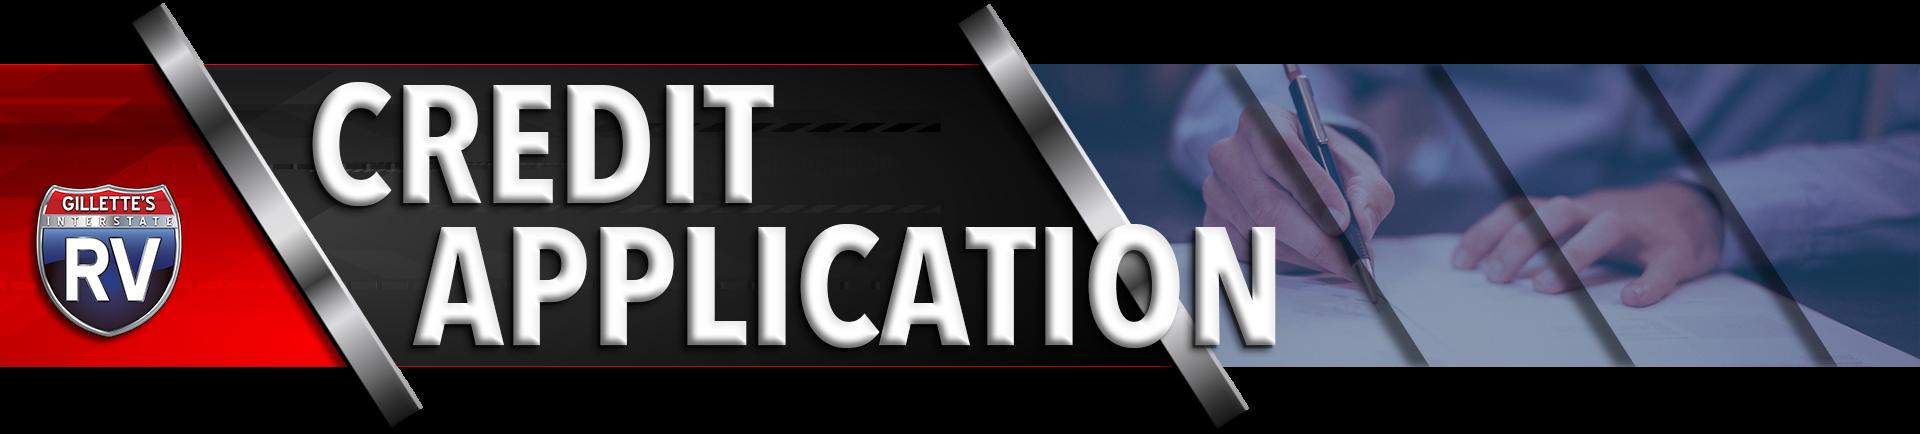 RV Credit Application at Gillette's Interstate RV